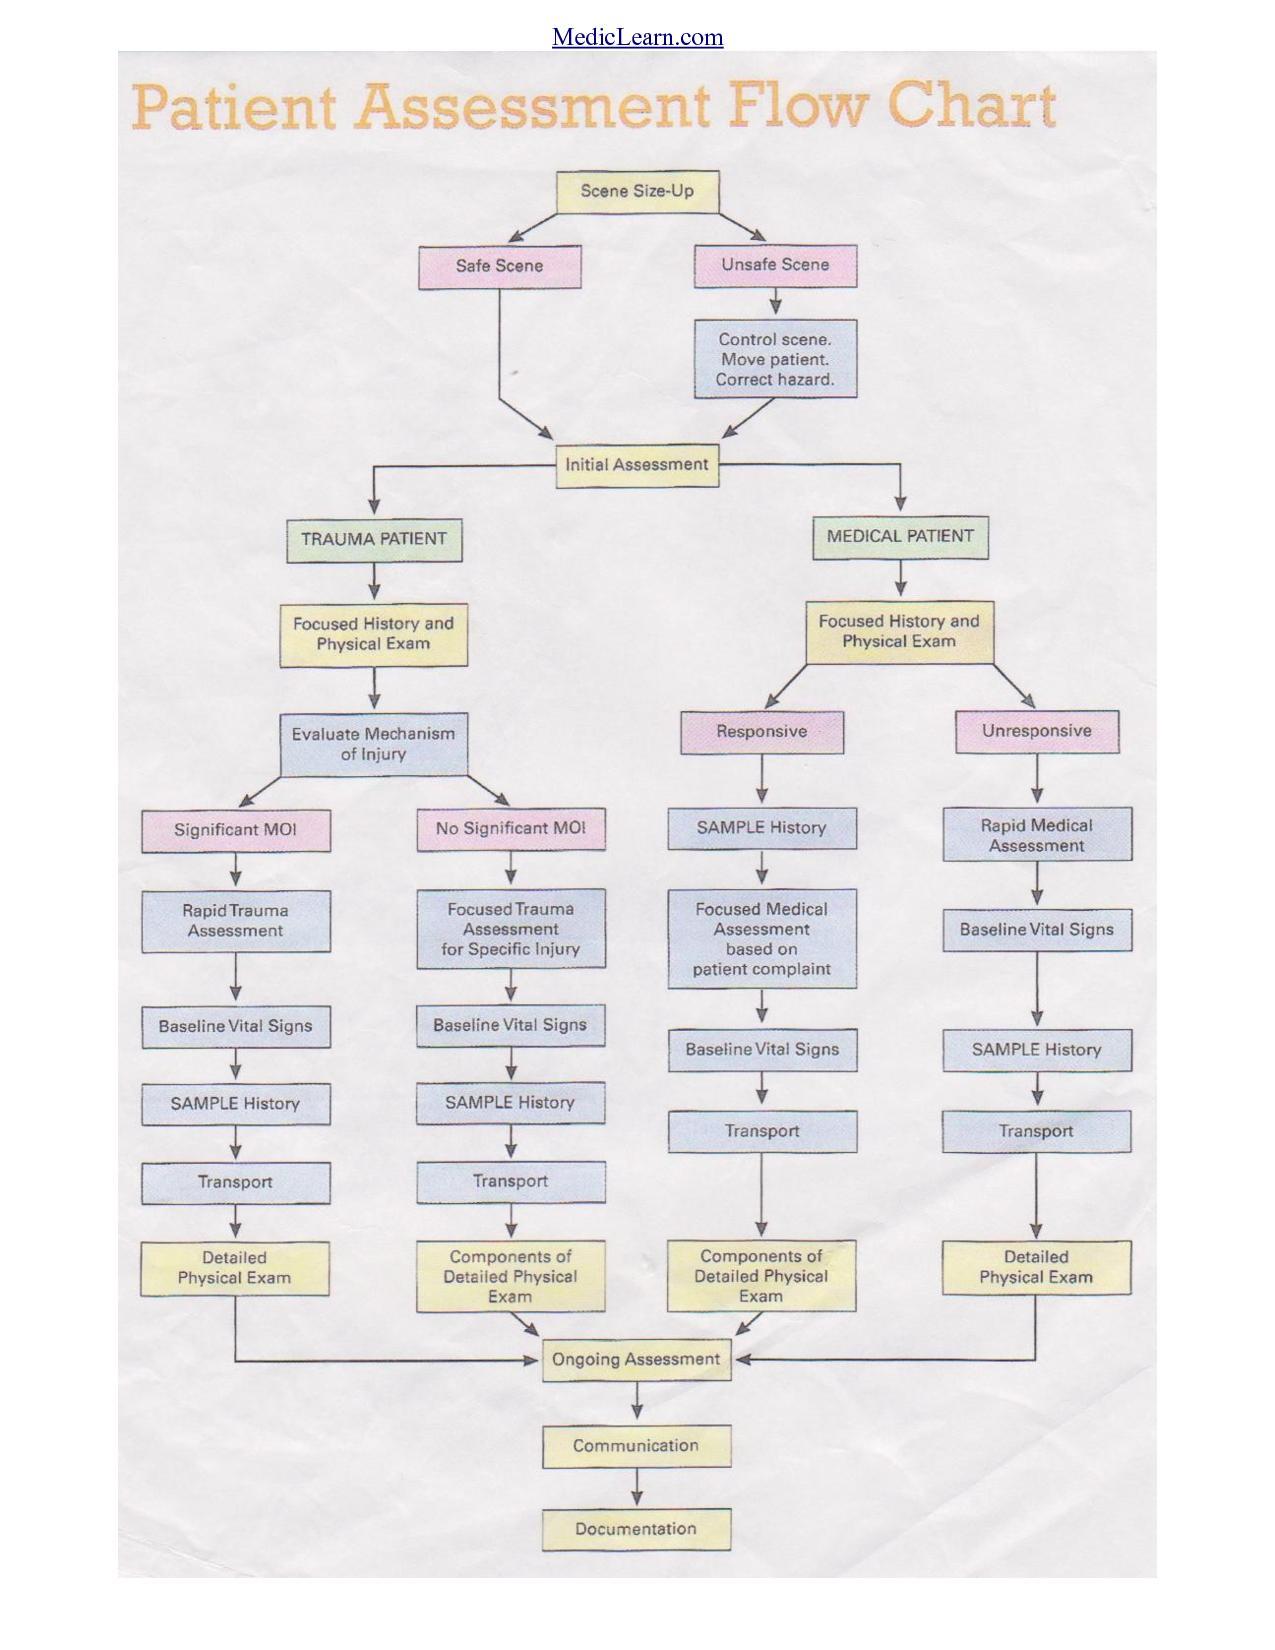 2d74a0a5c1dcdc7d20e3e80f11c012c6 assessment flow chart emt stuff pinterest emergency medical